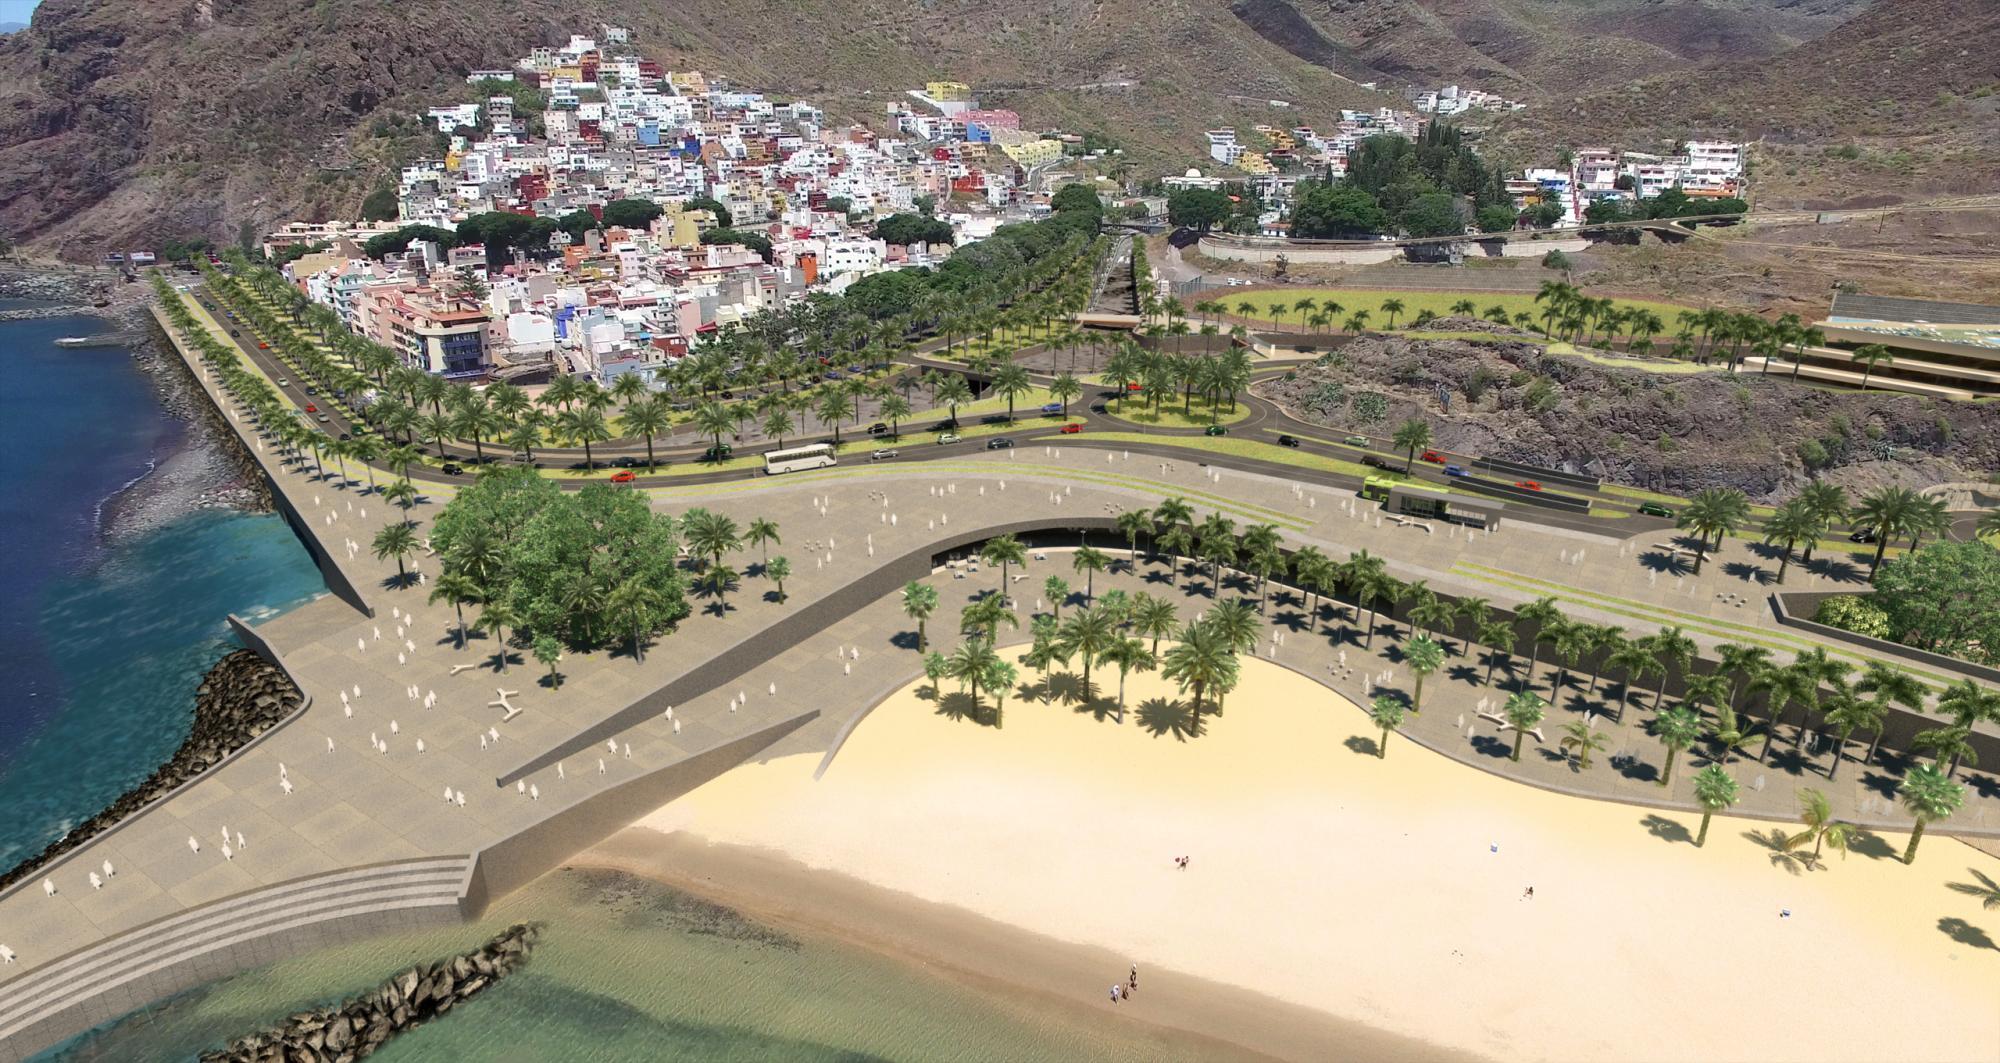 PE Frente Playa Teresitas